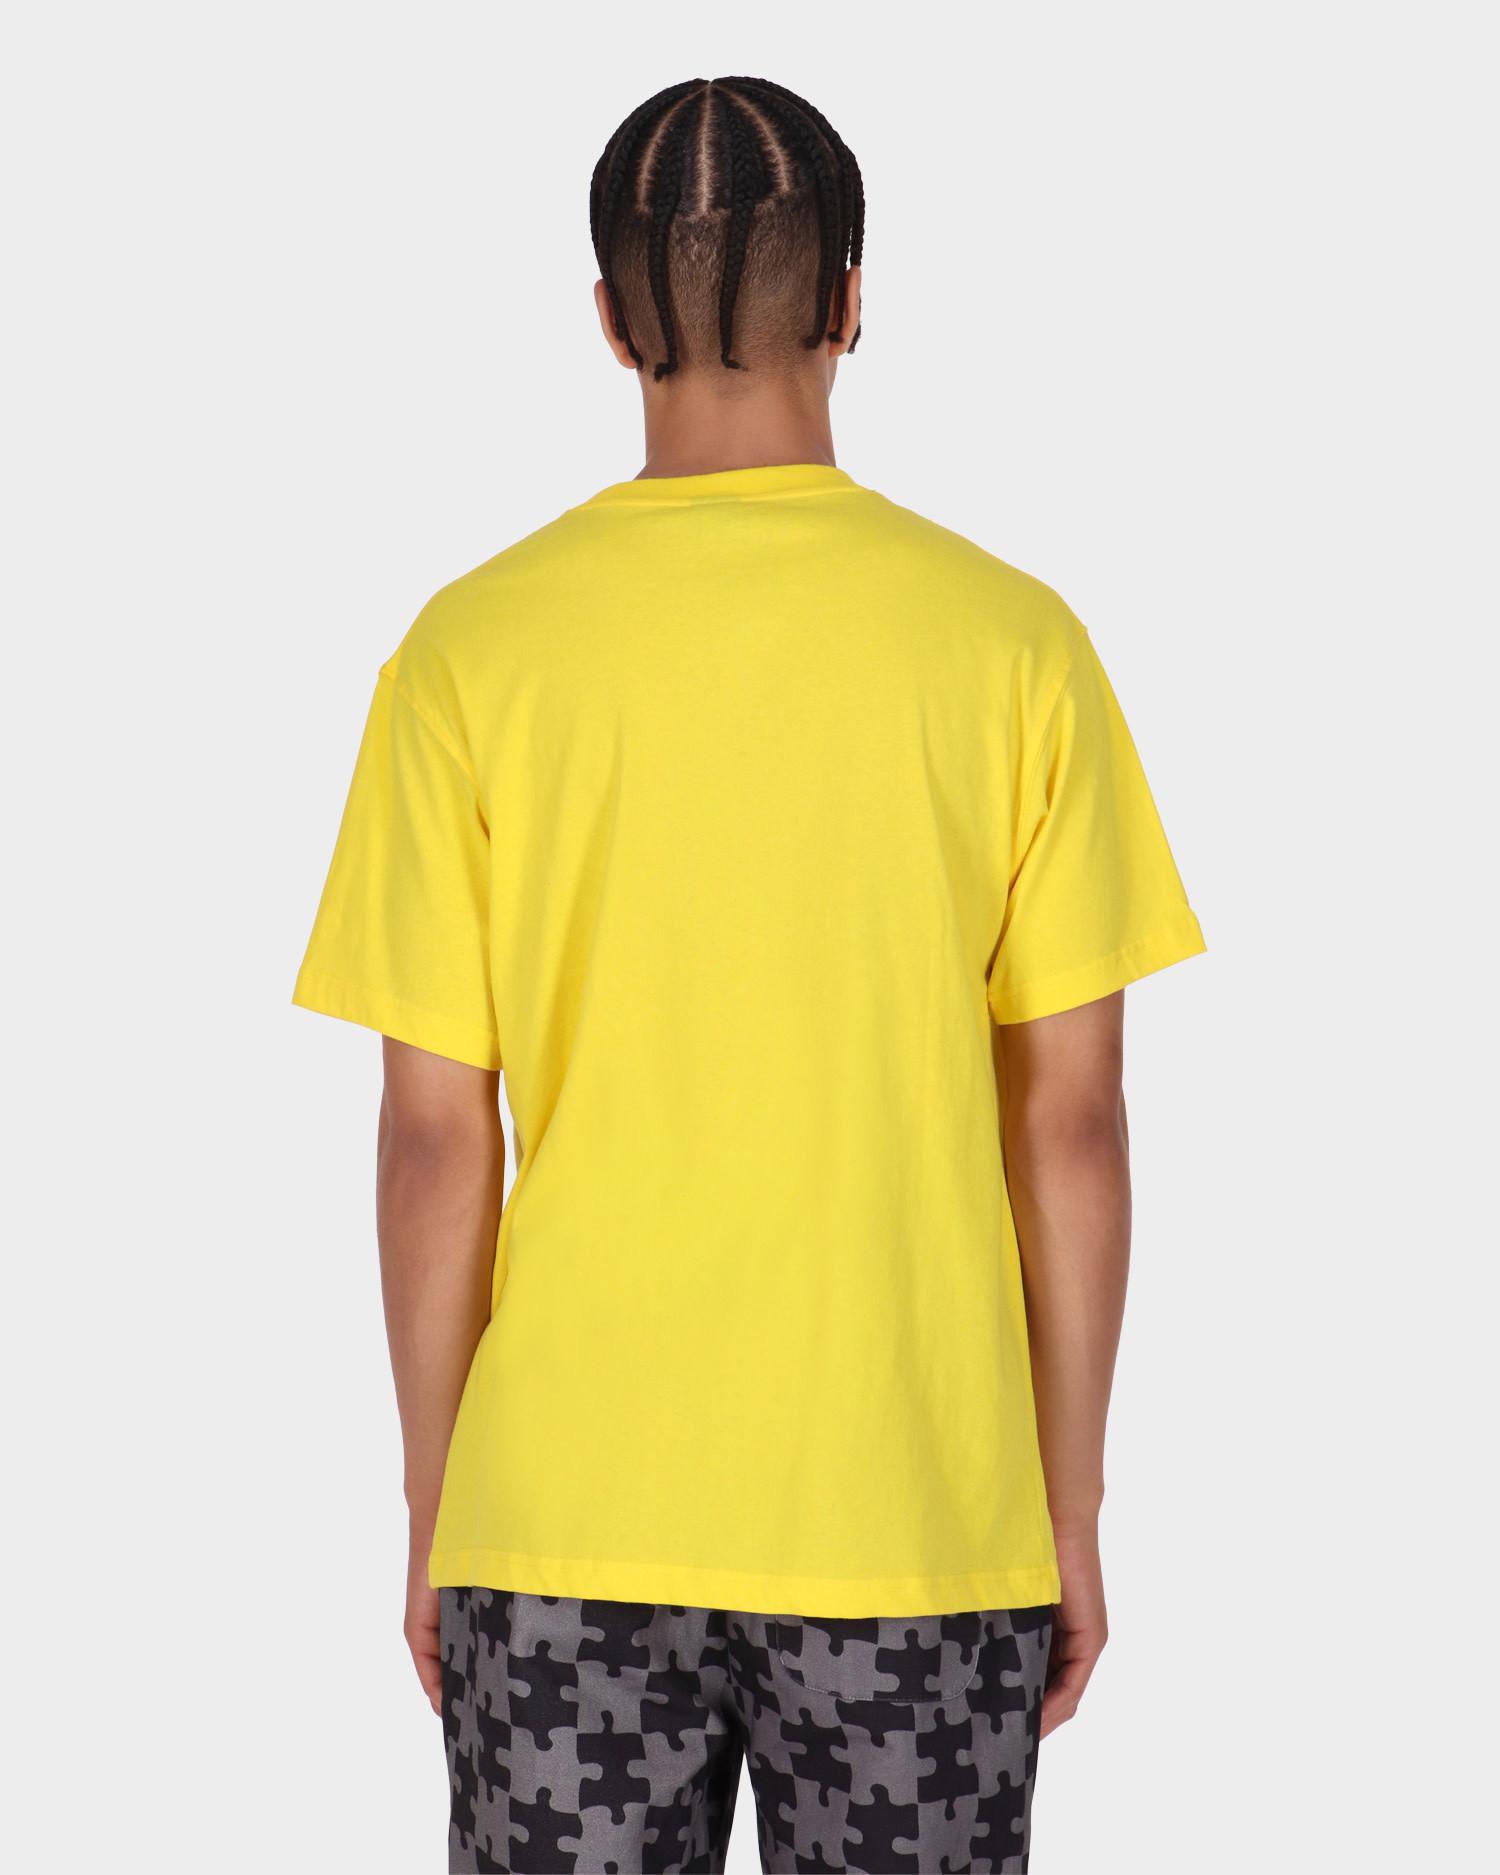 Dime Restoration Face T-Shirt Yellow